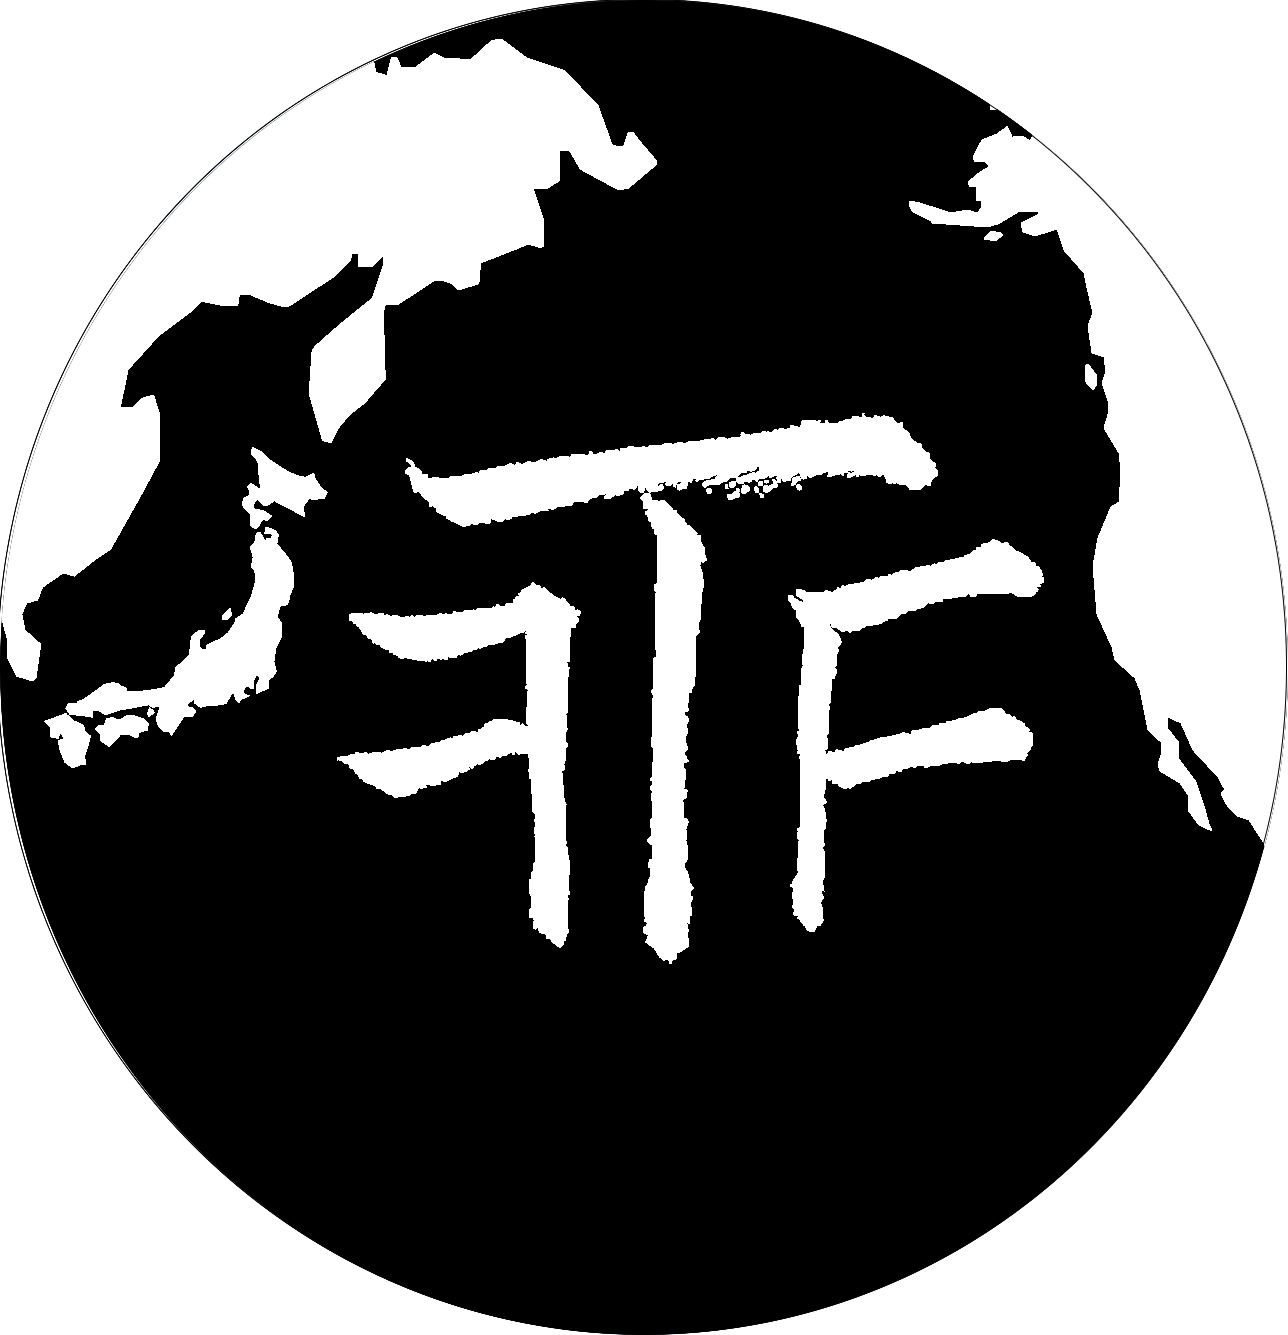 terasaki family foundation Logo-BW on white bg.jpg